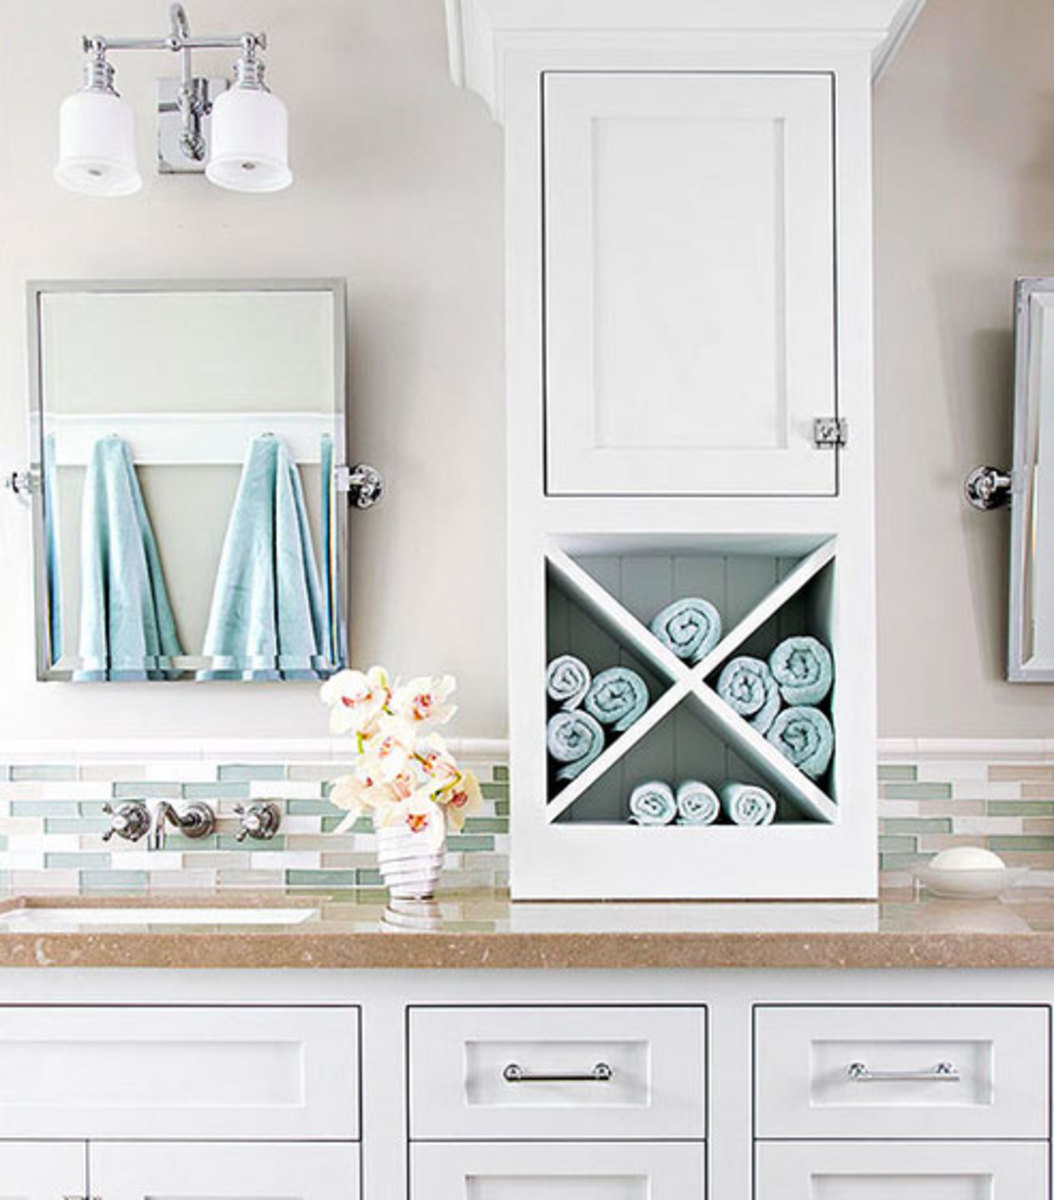 Countertop Solutions | Click Pic for 42 DIY Bathroom Organization Ideas